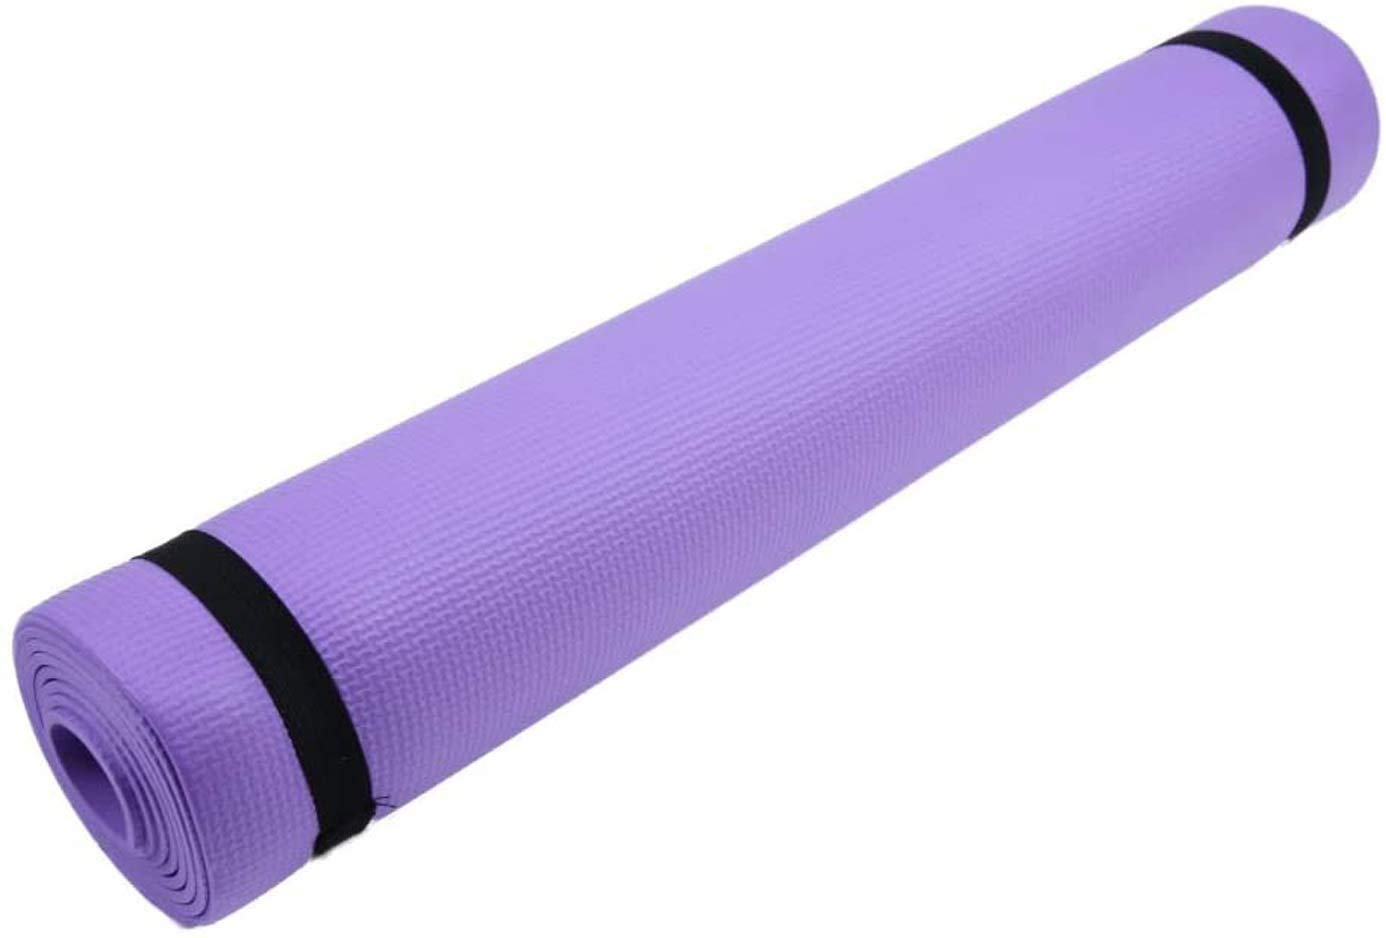 Sasimo 6MM Anti Skid, Light Weight yoga mat